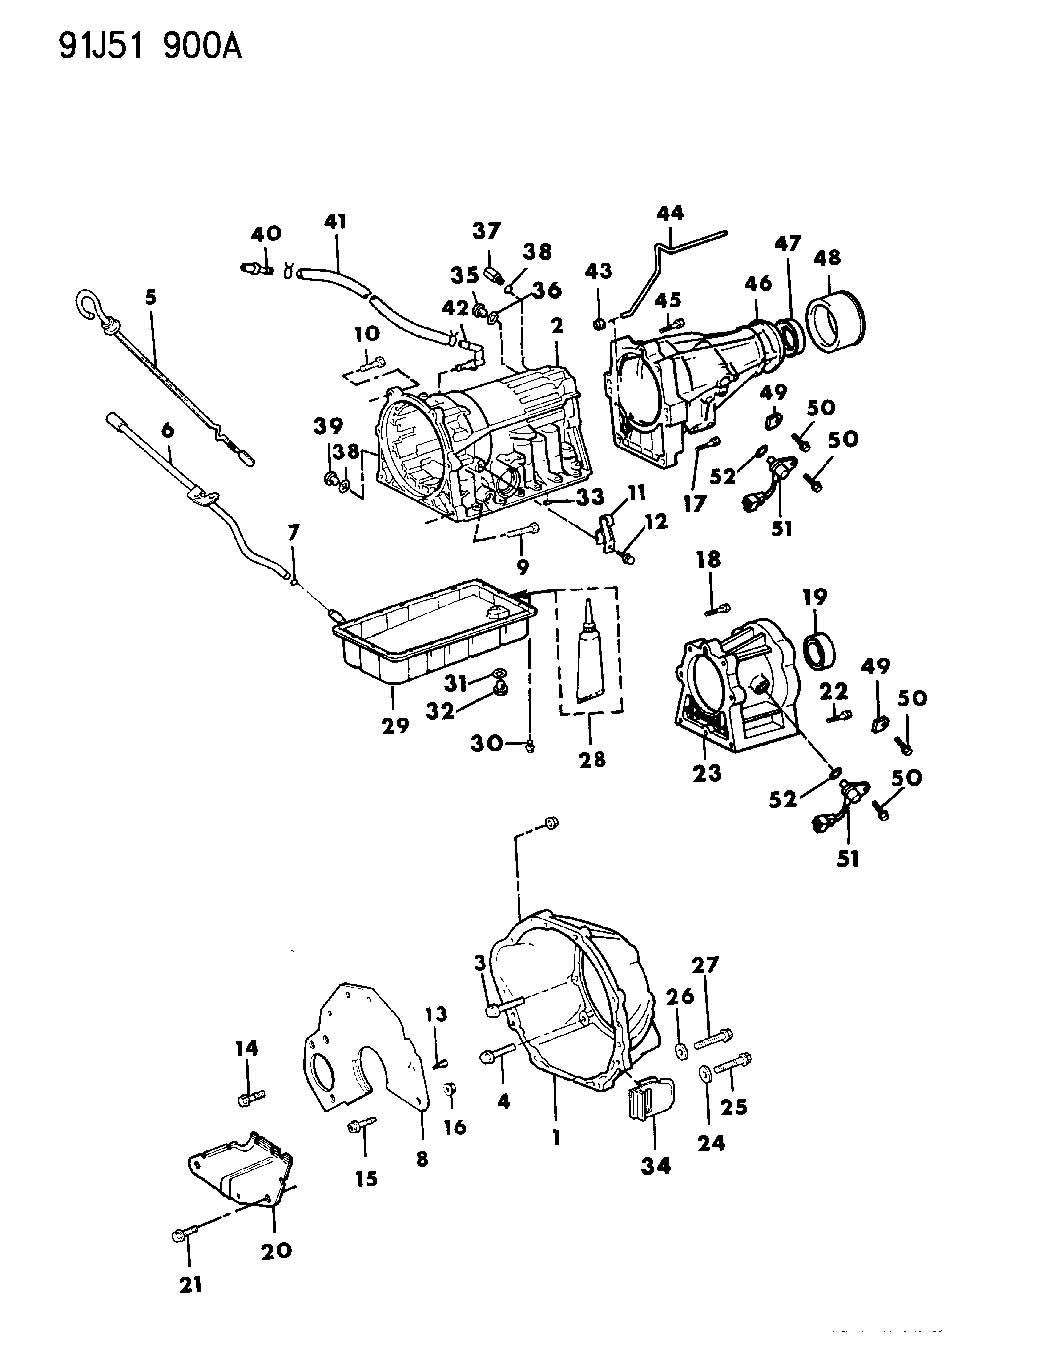 1995 Jeep Union. Transmission oil cooler. 52104180ab